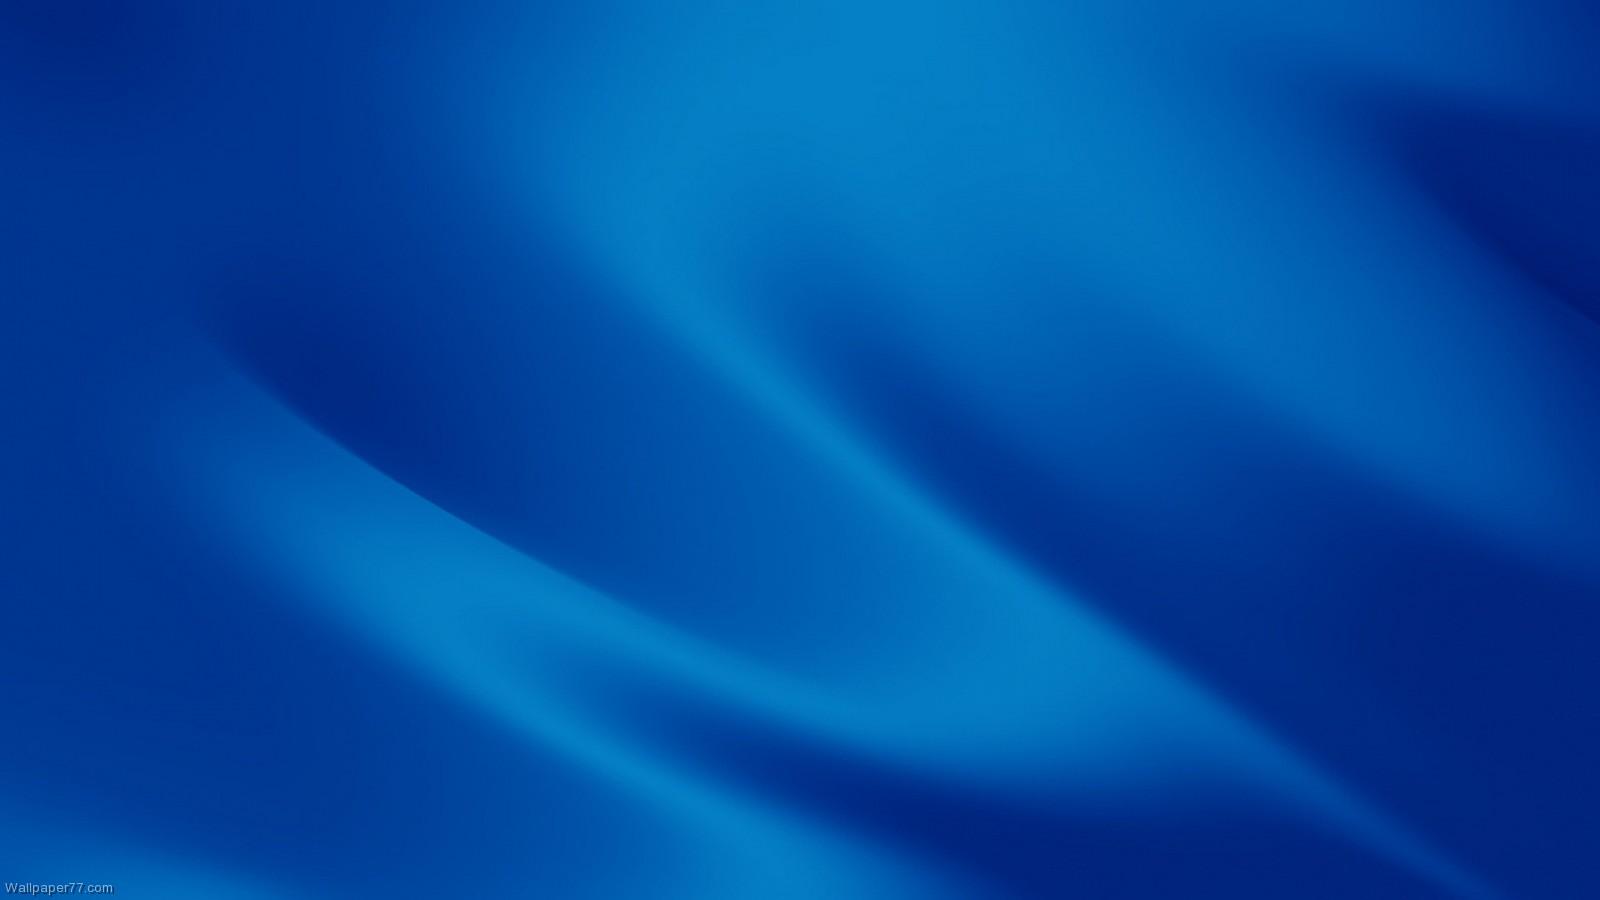 Dark Blue Abstract Wallpaper - WallpaperSafari